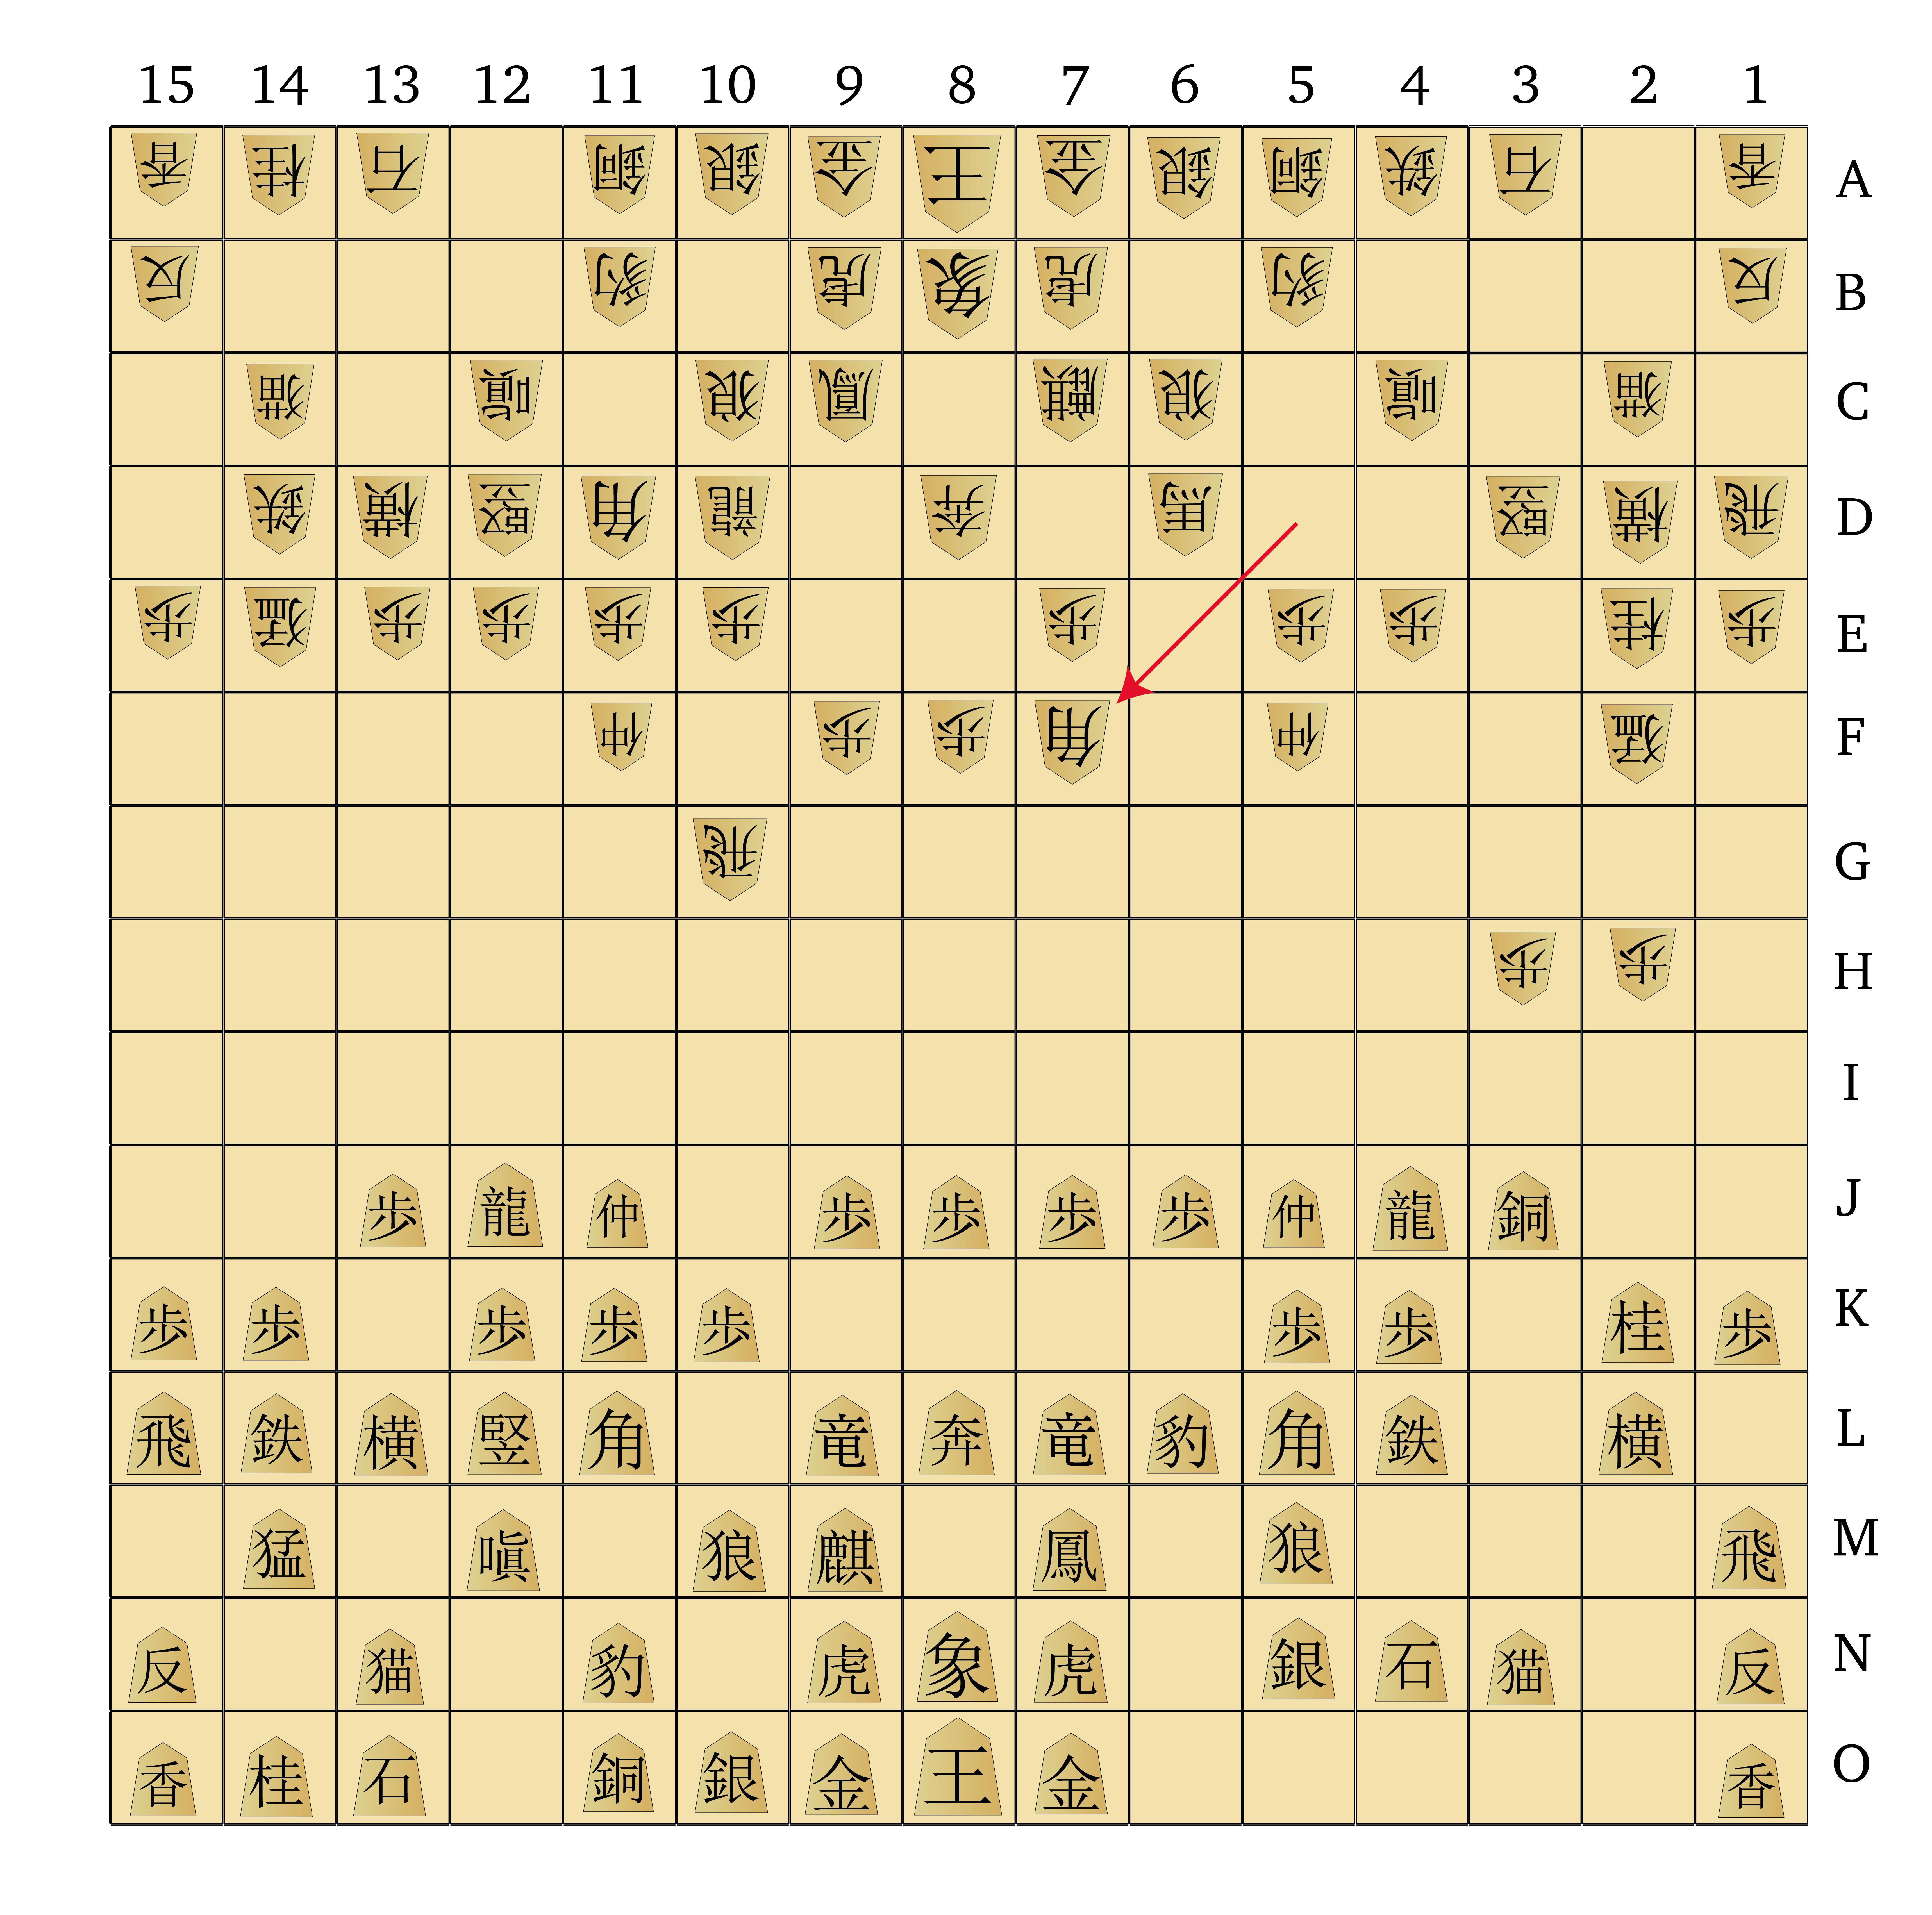 Dai Shogi 420 -- Move 100-01